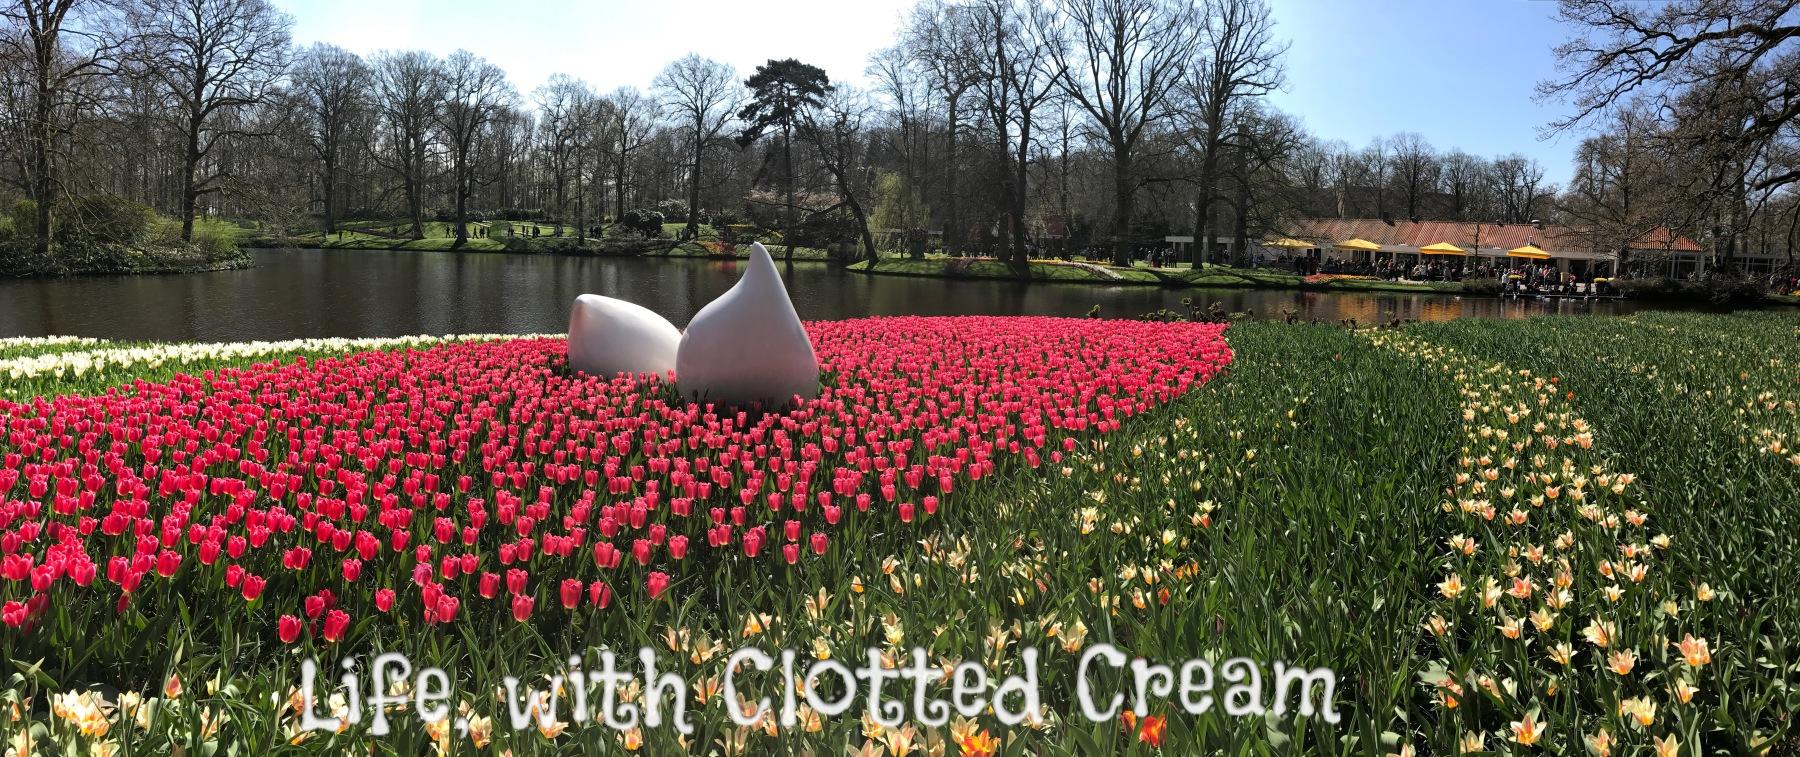 Tulips and daffodils in Keukenhof, Holland